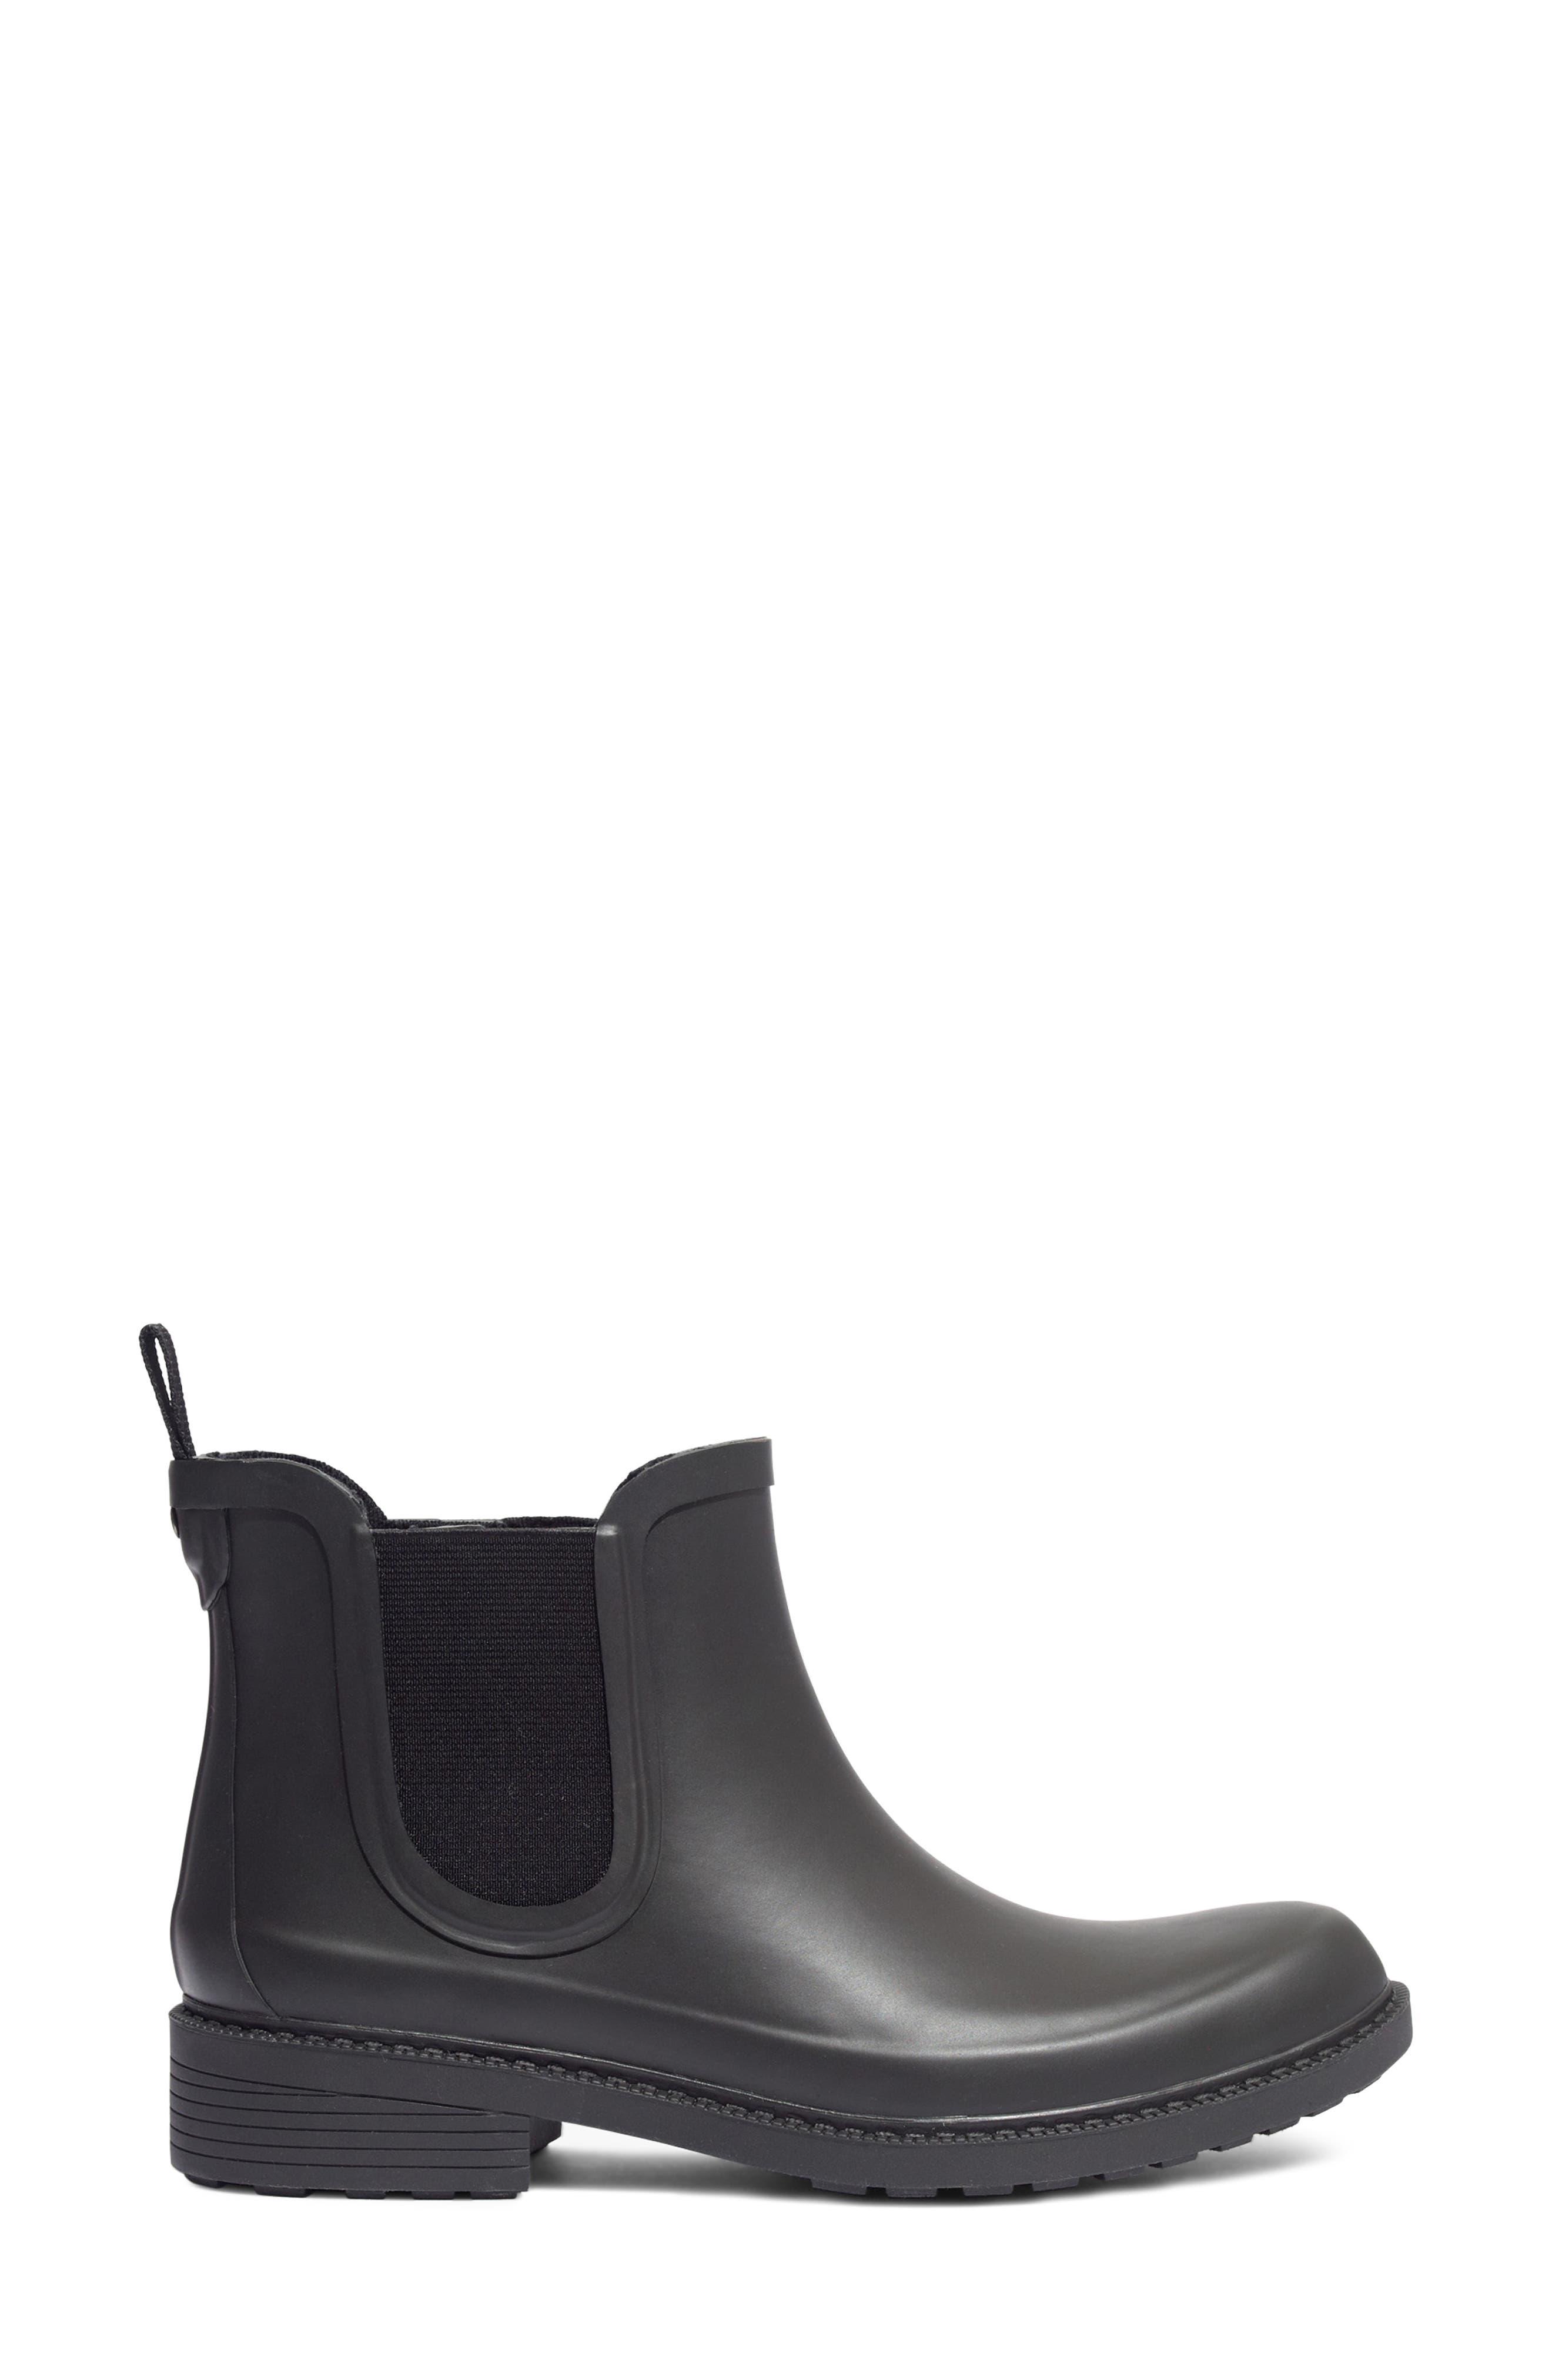 MADEWELL, The Chelsea Rain Boot, Alternate thumbnail 3, color, TRUE BLACK RUBBER